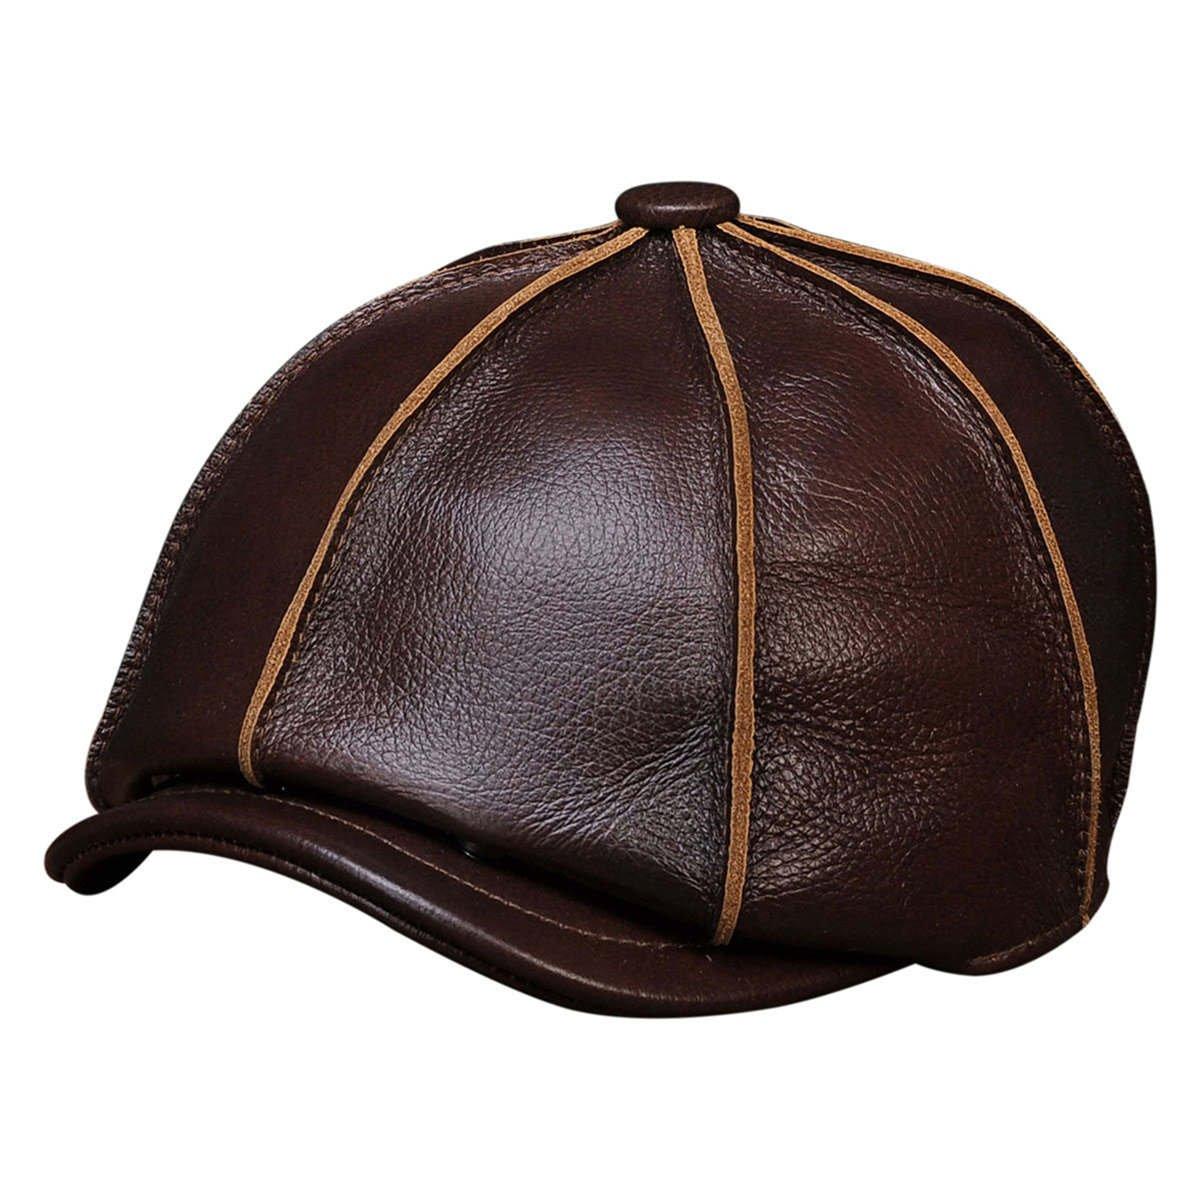 Haisum Men s Leather Flat Cap 0b322662d04